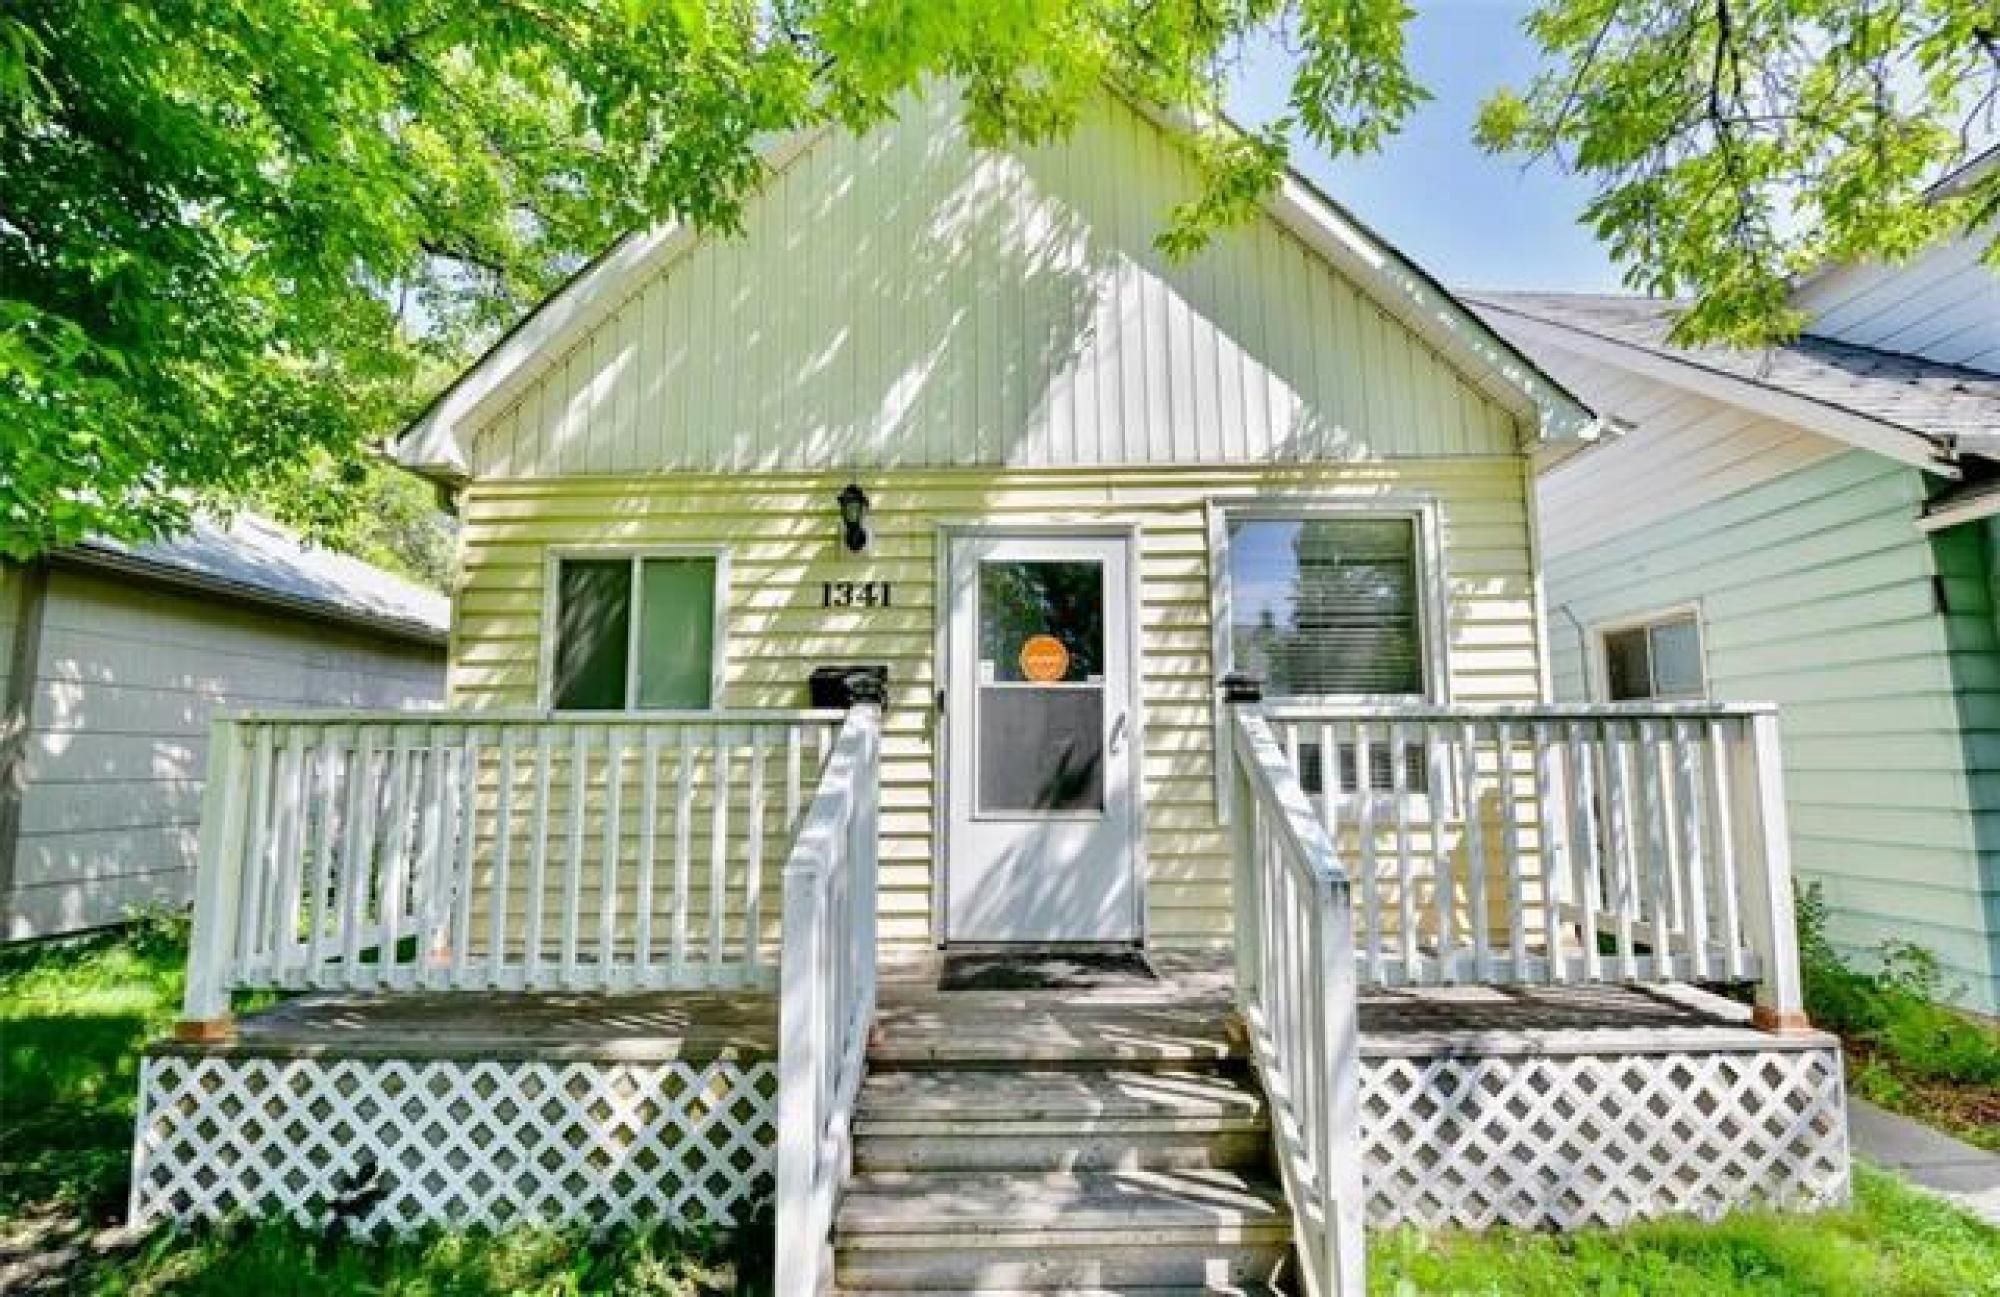 Pleasant 1341 Manitoba Avenue R2X 0L1 2 Bedroom For Sale North West Complete Home Design Collection Barbaintelli Responsecom